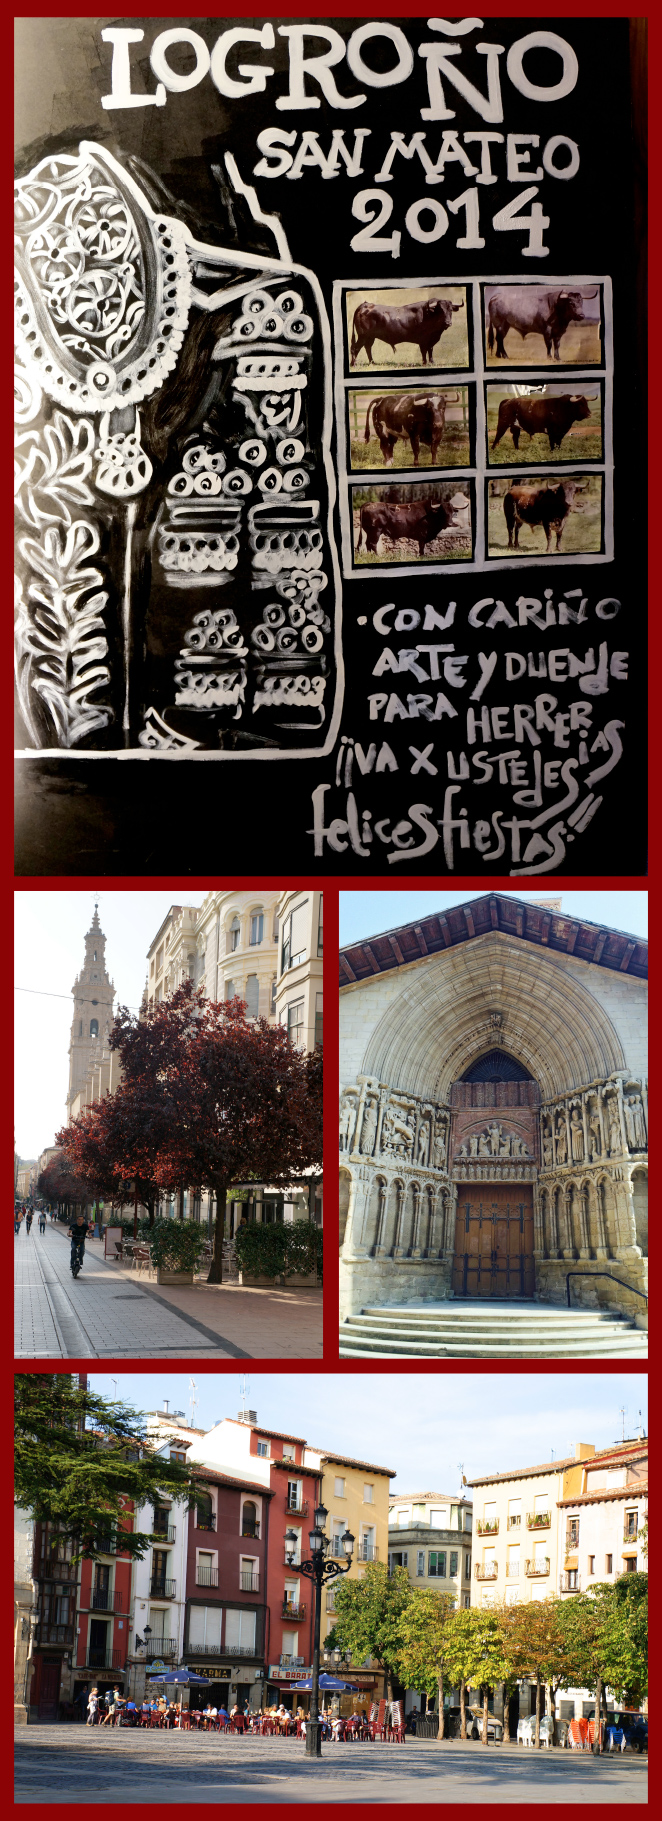 Logroño, cuyas famosas Fiestas de San Mateo estaban culminando.